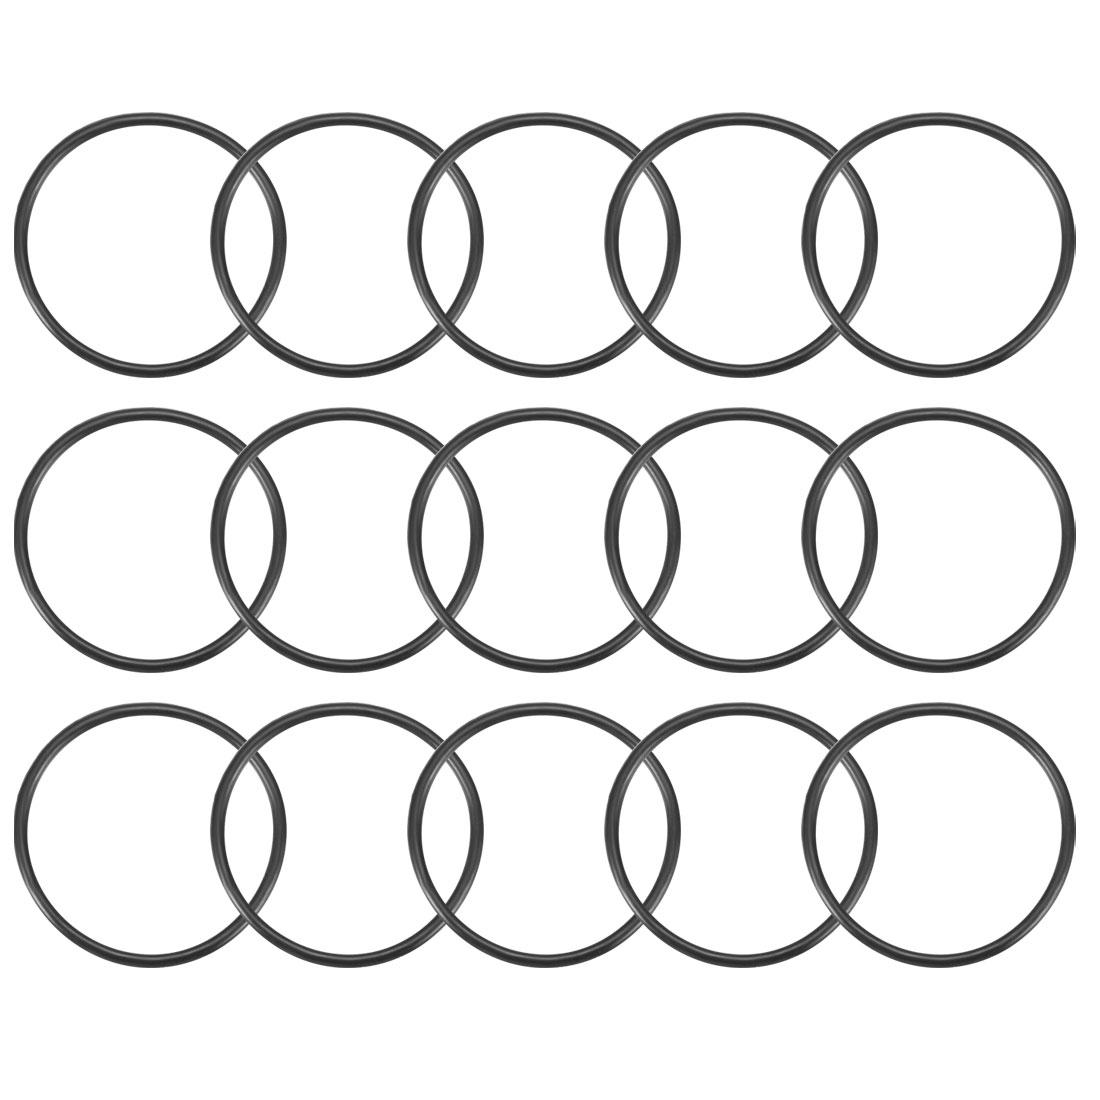 15Pcs Black 36 x 2mm Industrial Flexible Rubber O Ring Oil Sealing Grommets